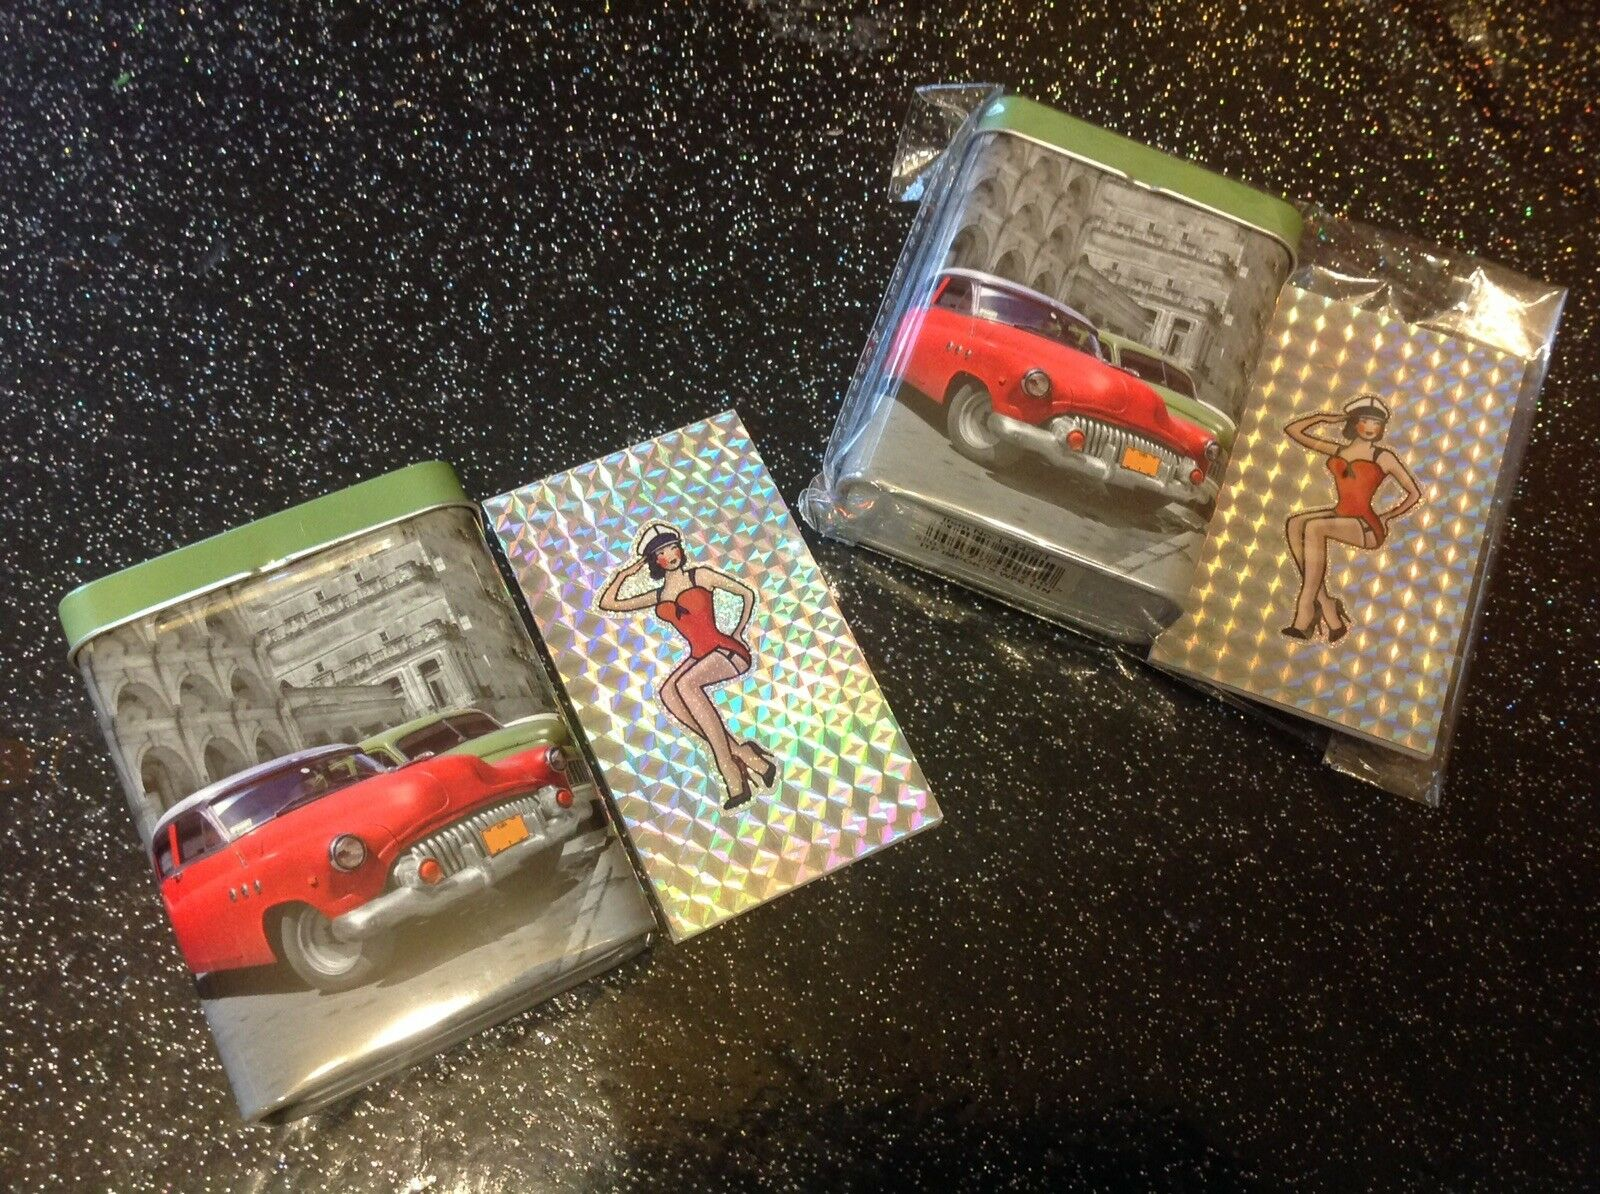 Retro Rockabilly Pin Up 50's girl Notepad +1952 Buick Car Tin 2pc Gift Set